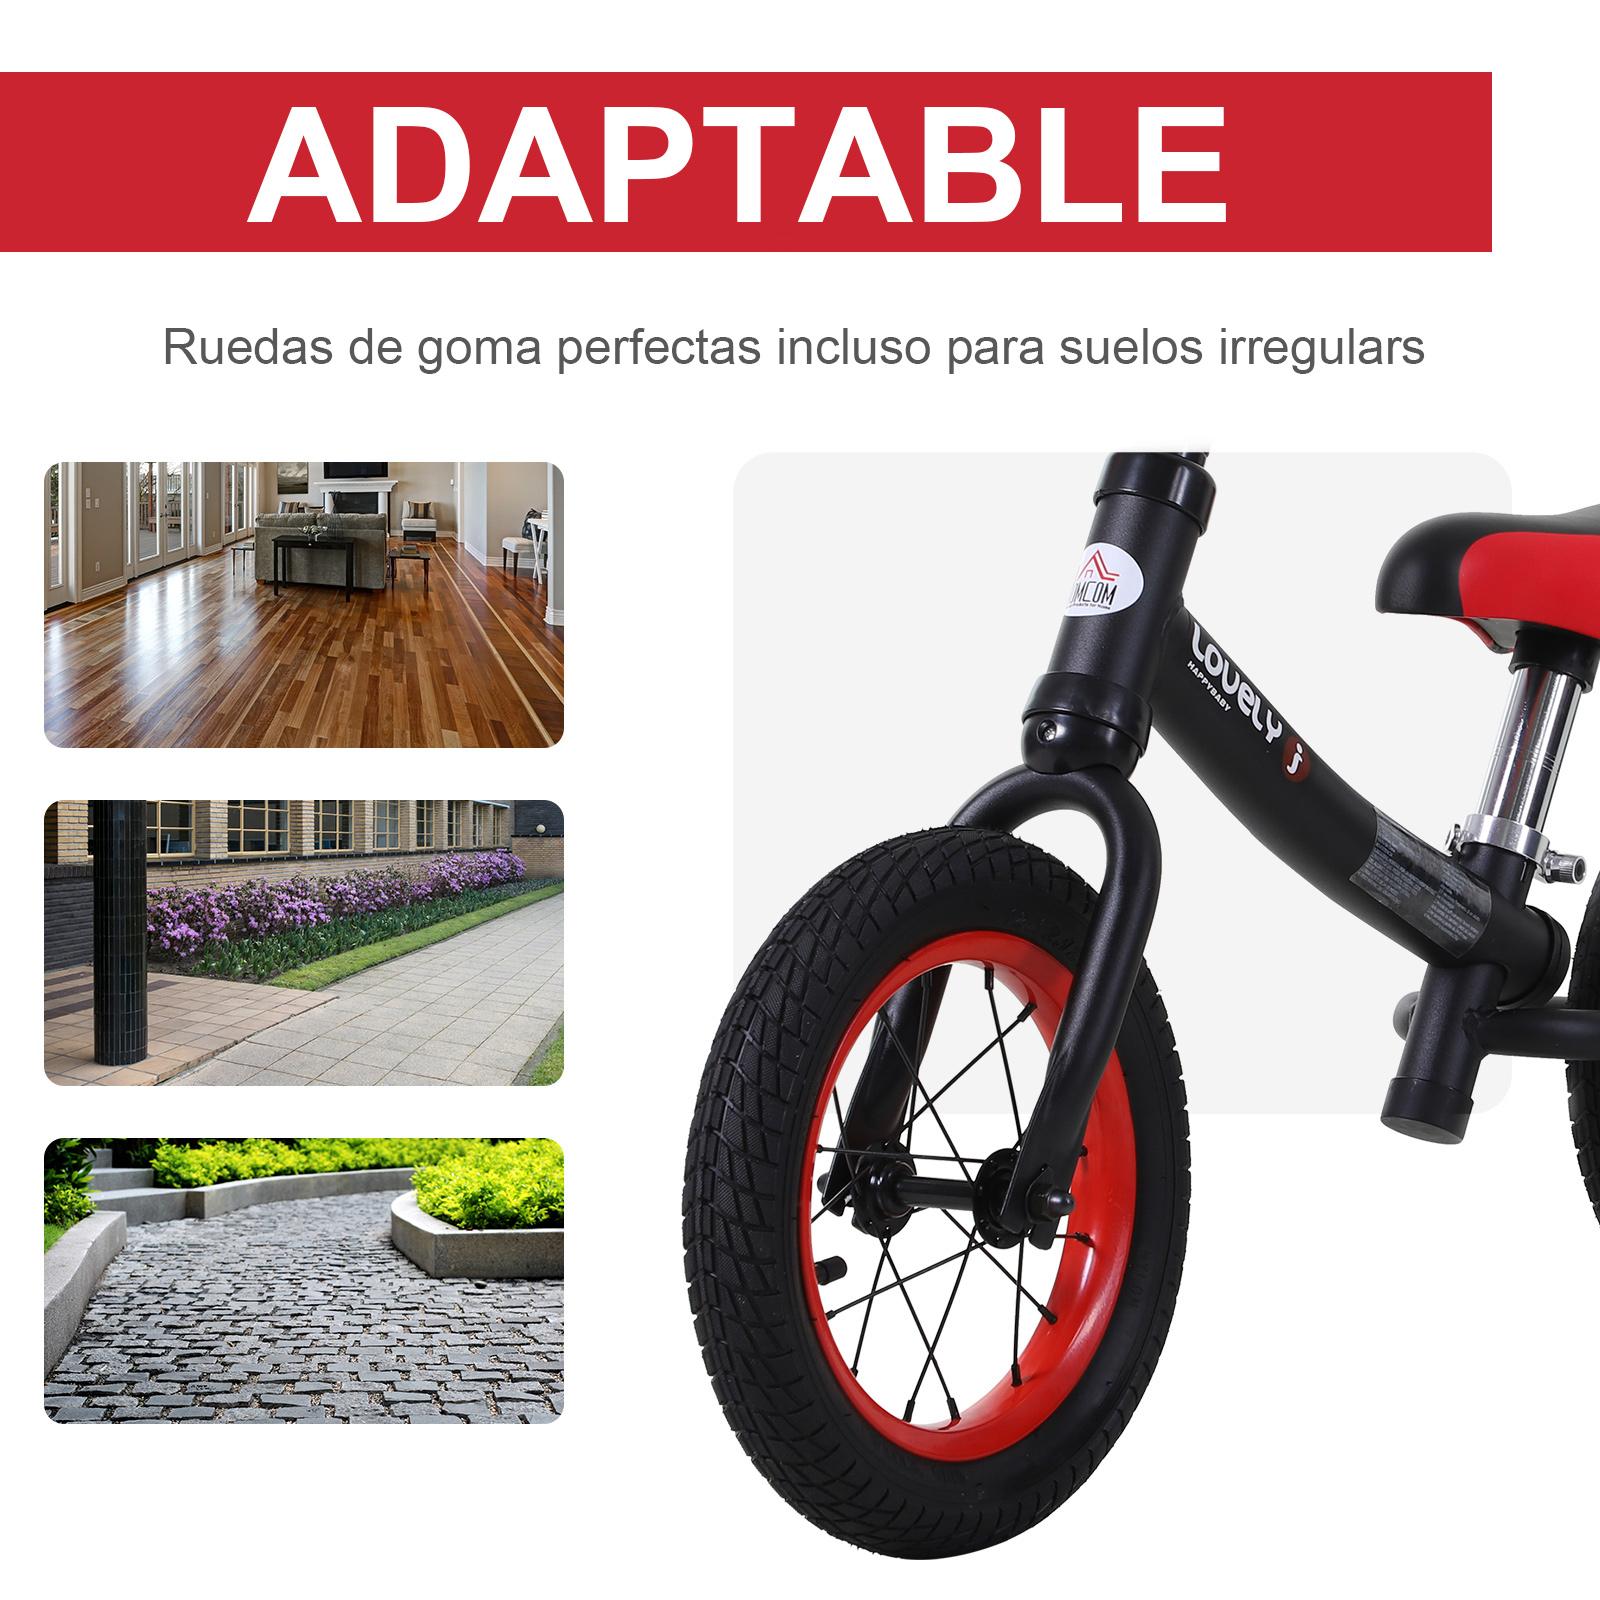 Bicicleta-sin-Pedales-de-Altura-de-Asiento-Regulable-31-45cm-2-5-Anos miniatura 8